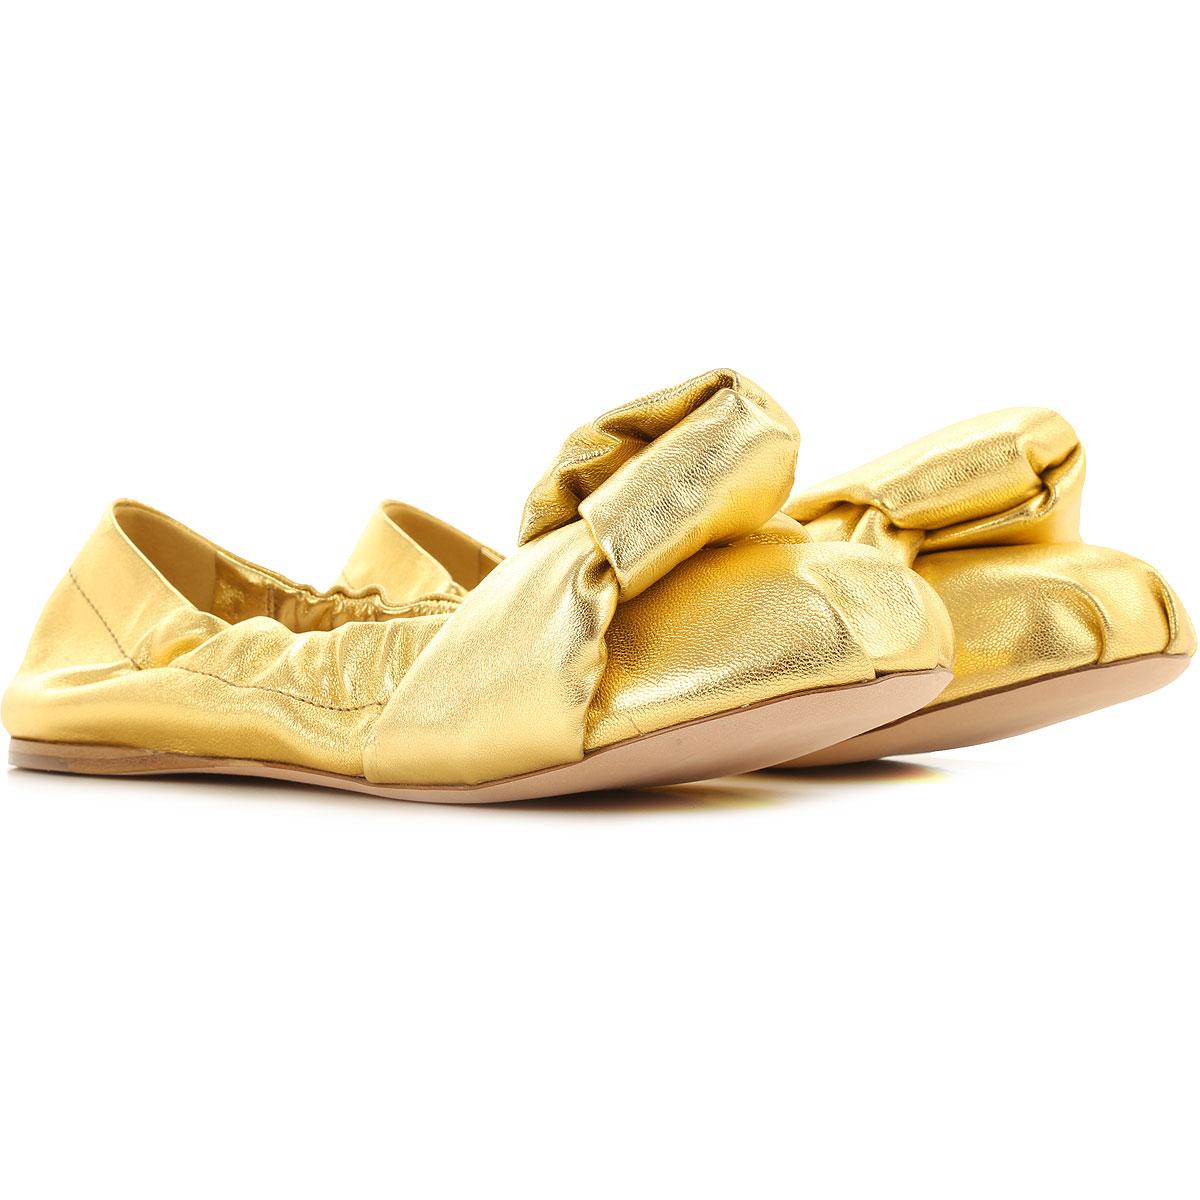 Miu Miu Ballet Flats Ballerina Shoes for Women, Metal Gold, Leather, 2019, 5.5 6 6.5 7 7.5 8 8.5 9